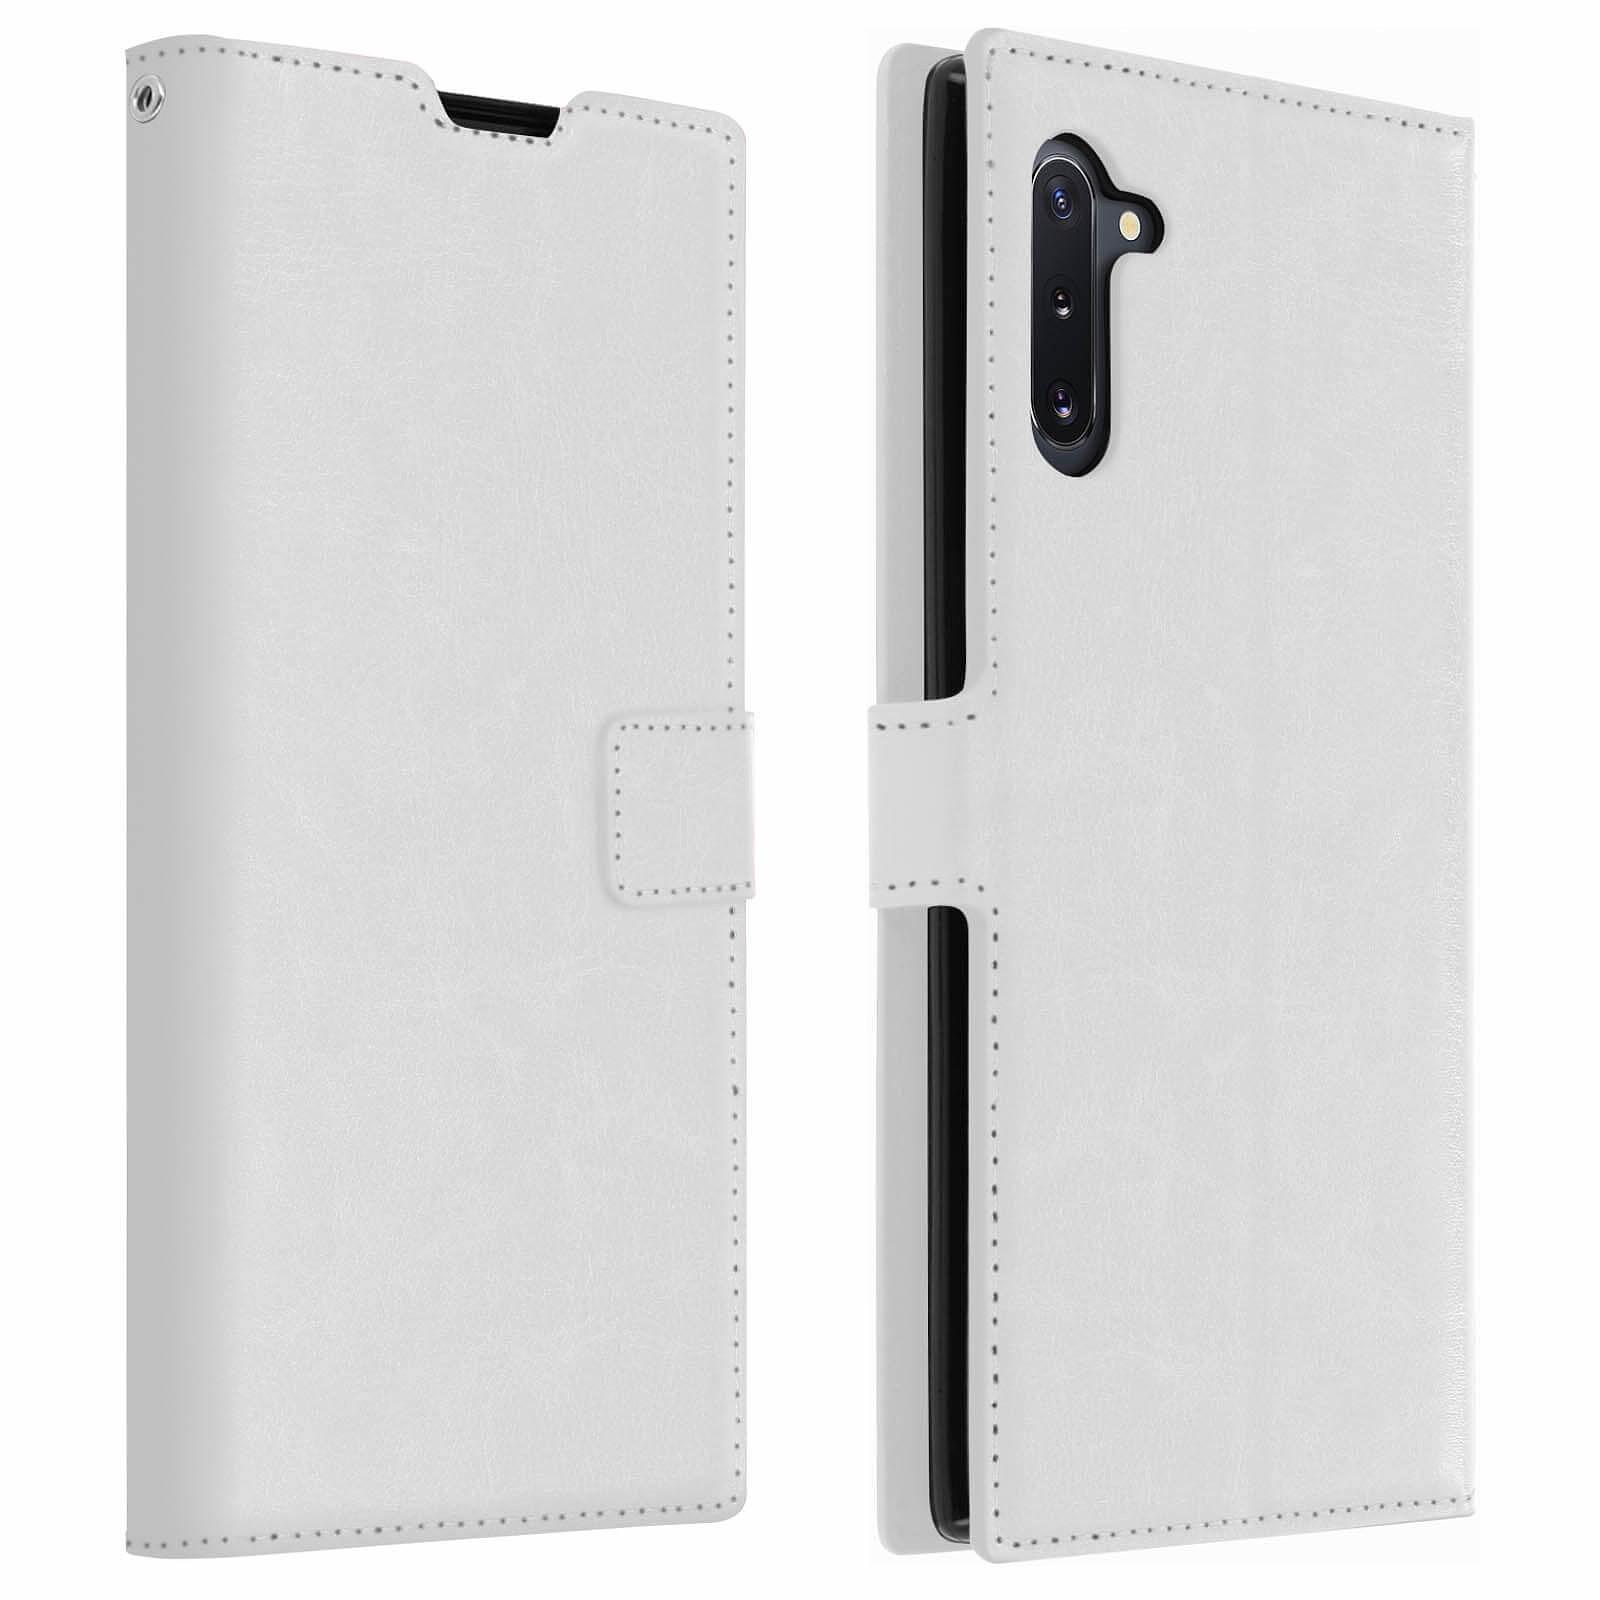 Avizar Etui folio Blanc Vintage pour Samsung Galaxy Note 10